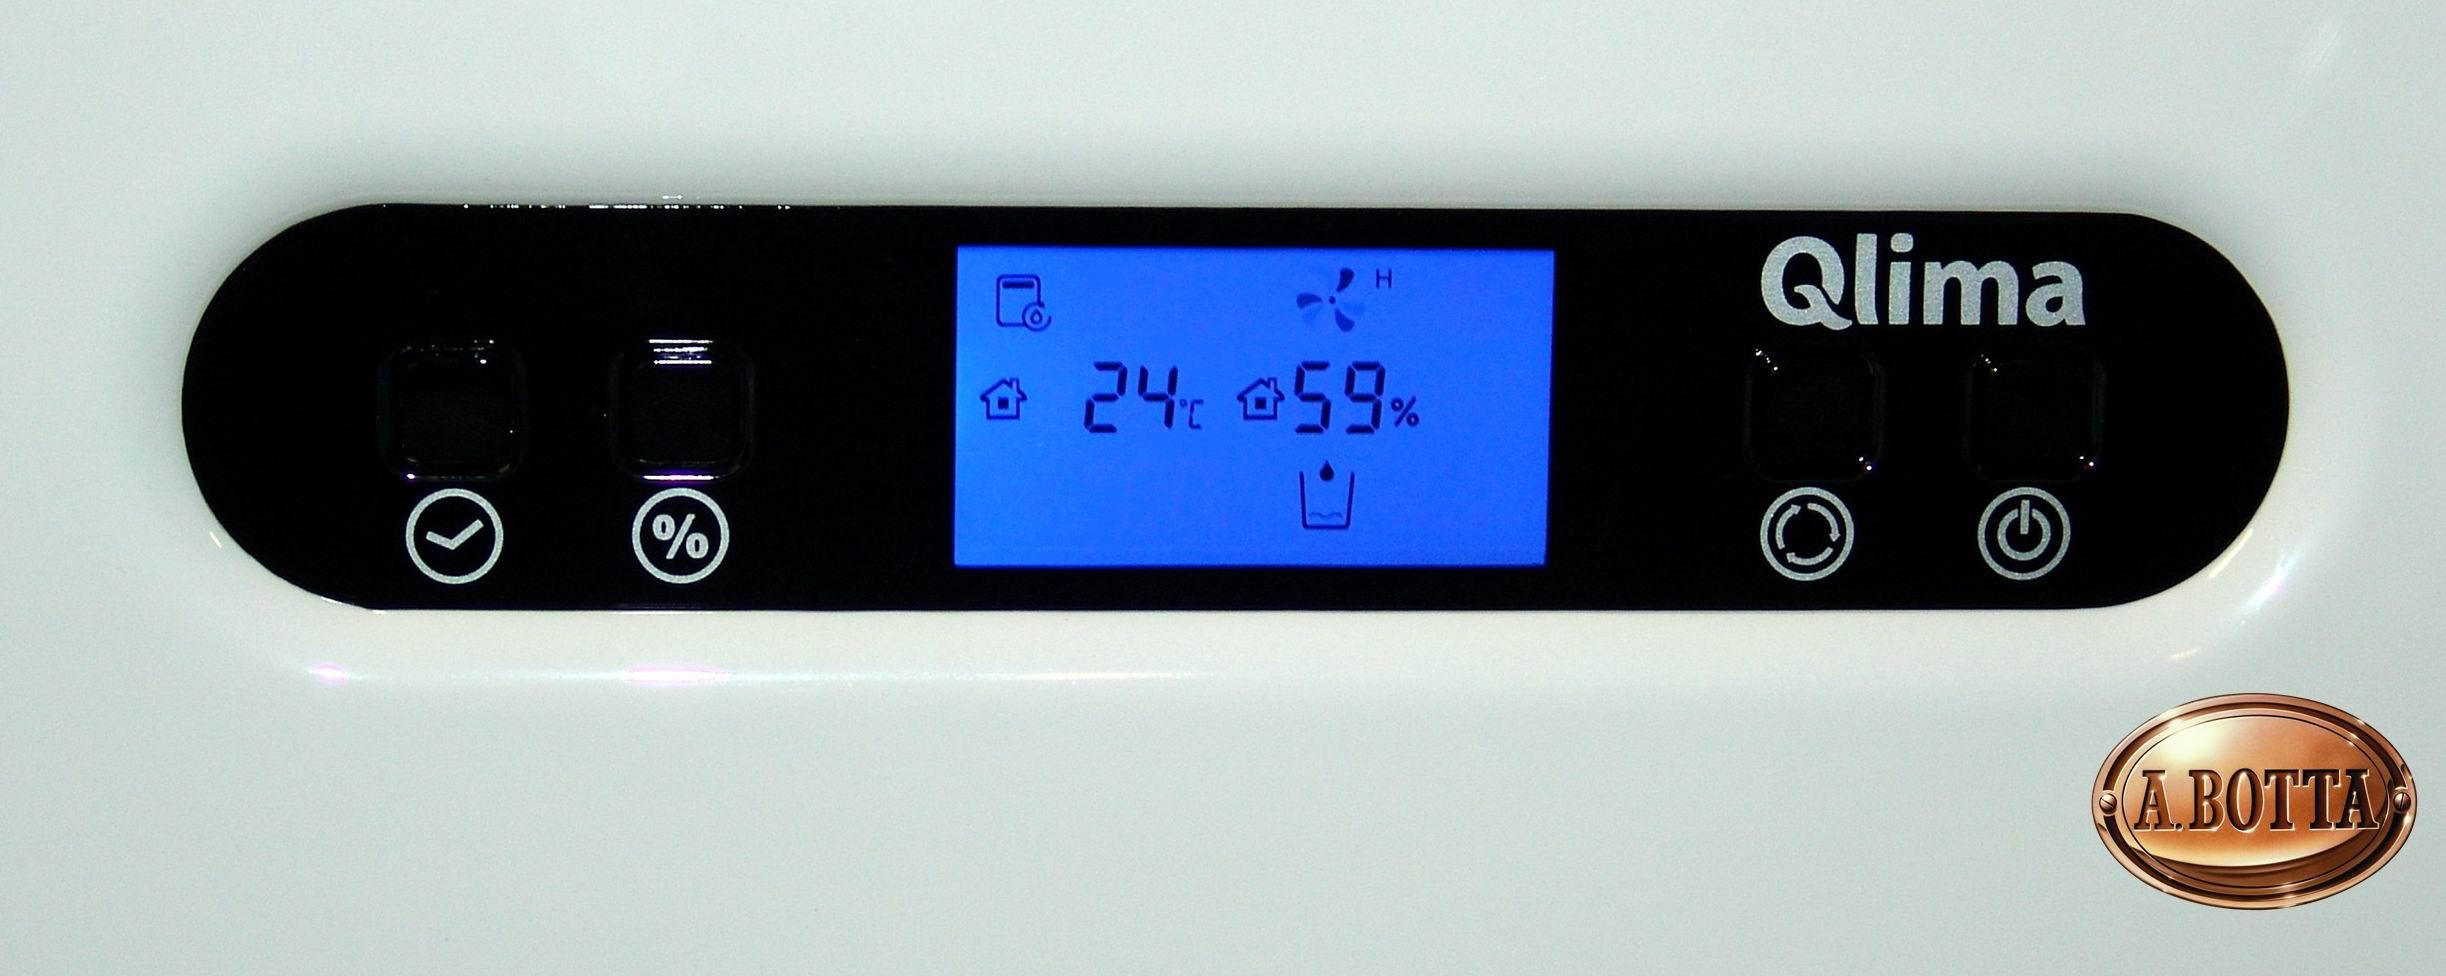 air dehumidifier qlima zibro kamin d512 12 liters in 24. Black Bedroom Furniture Sets. Home Design Ideas